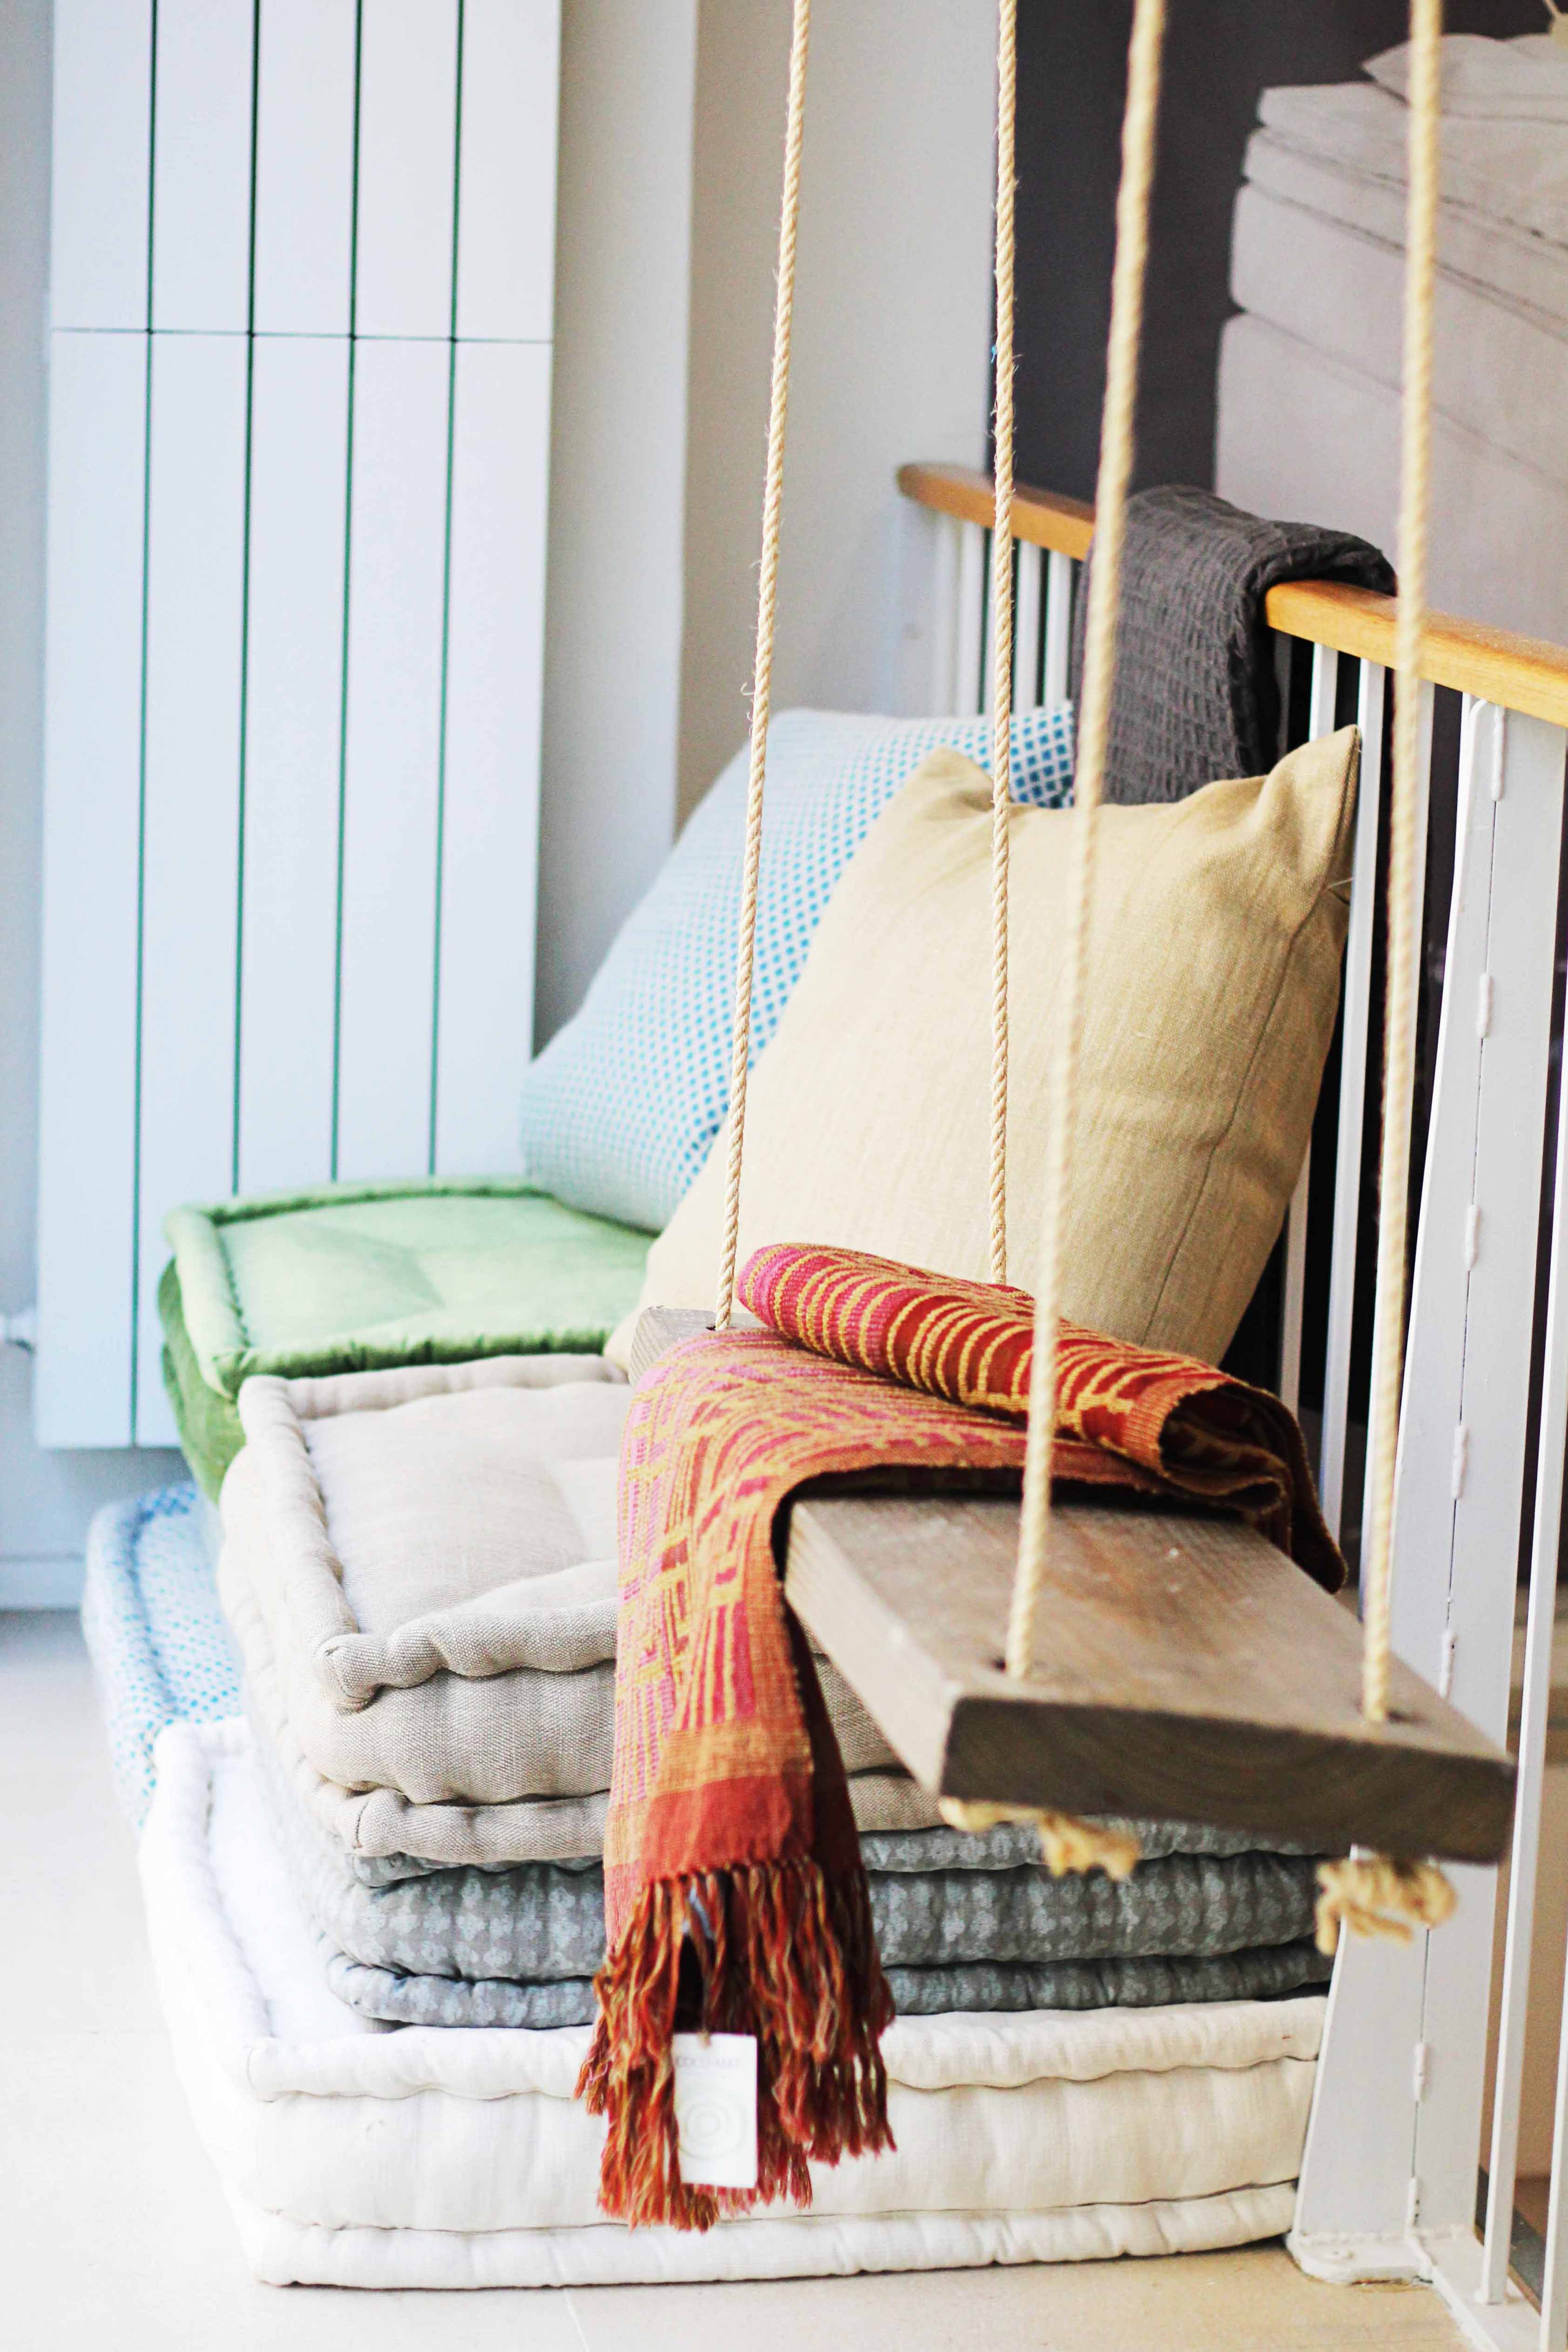 Coco mat sleep on nature con botas de agua - Hacer cojines para sillas ...